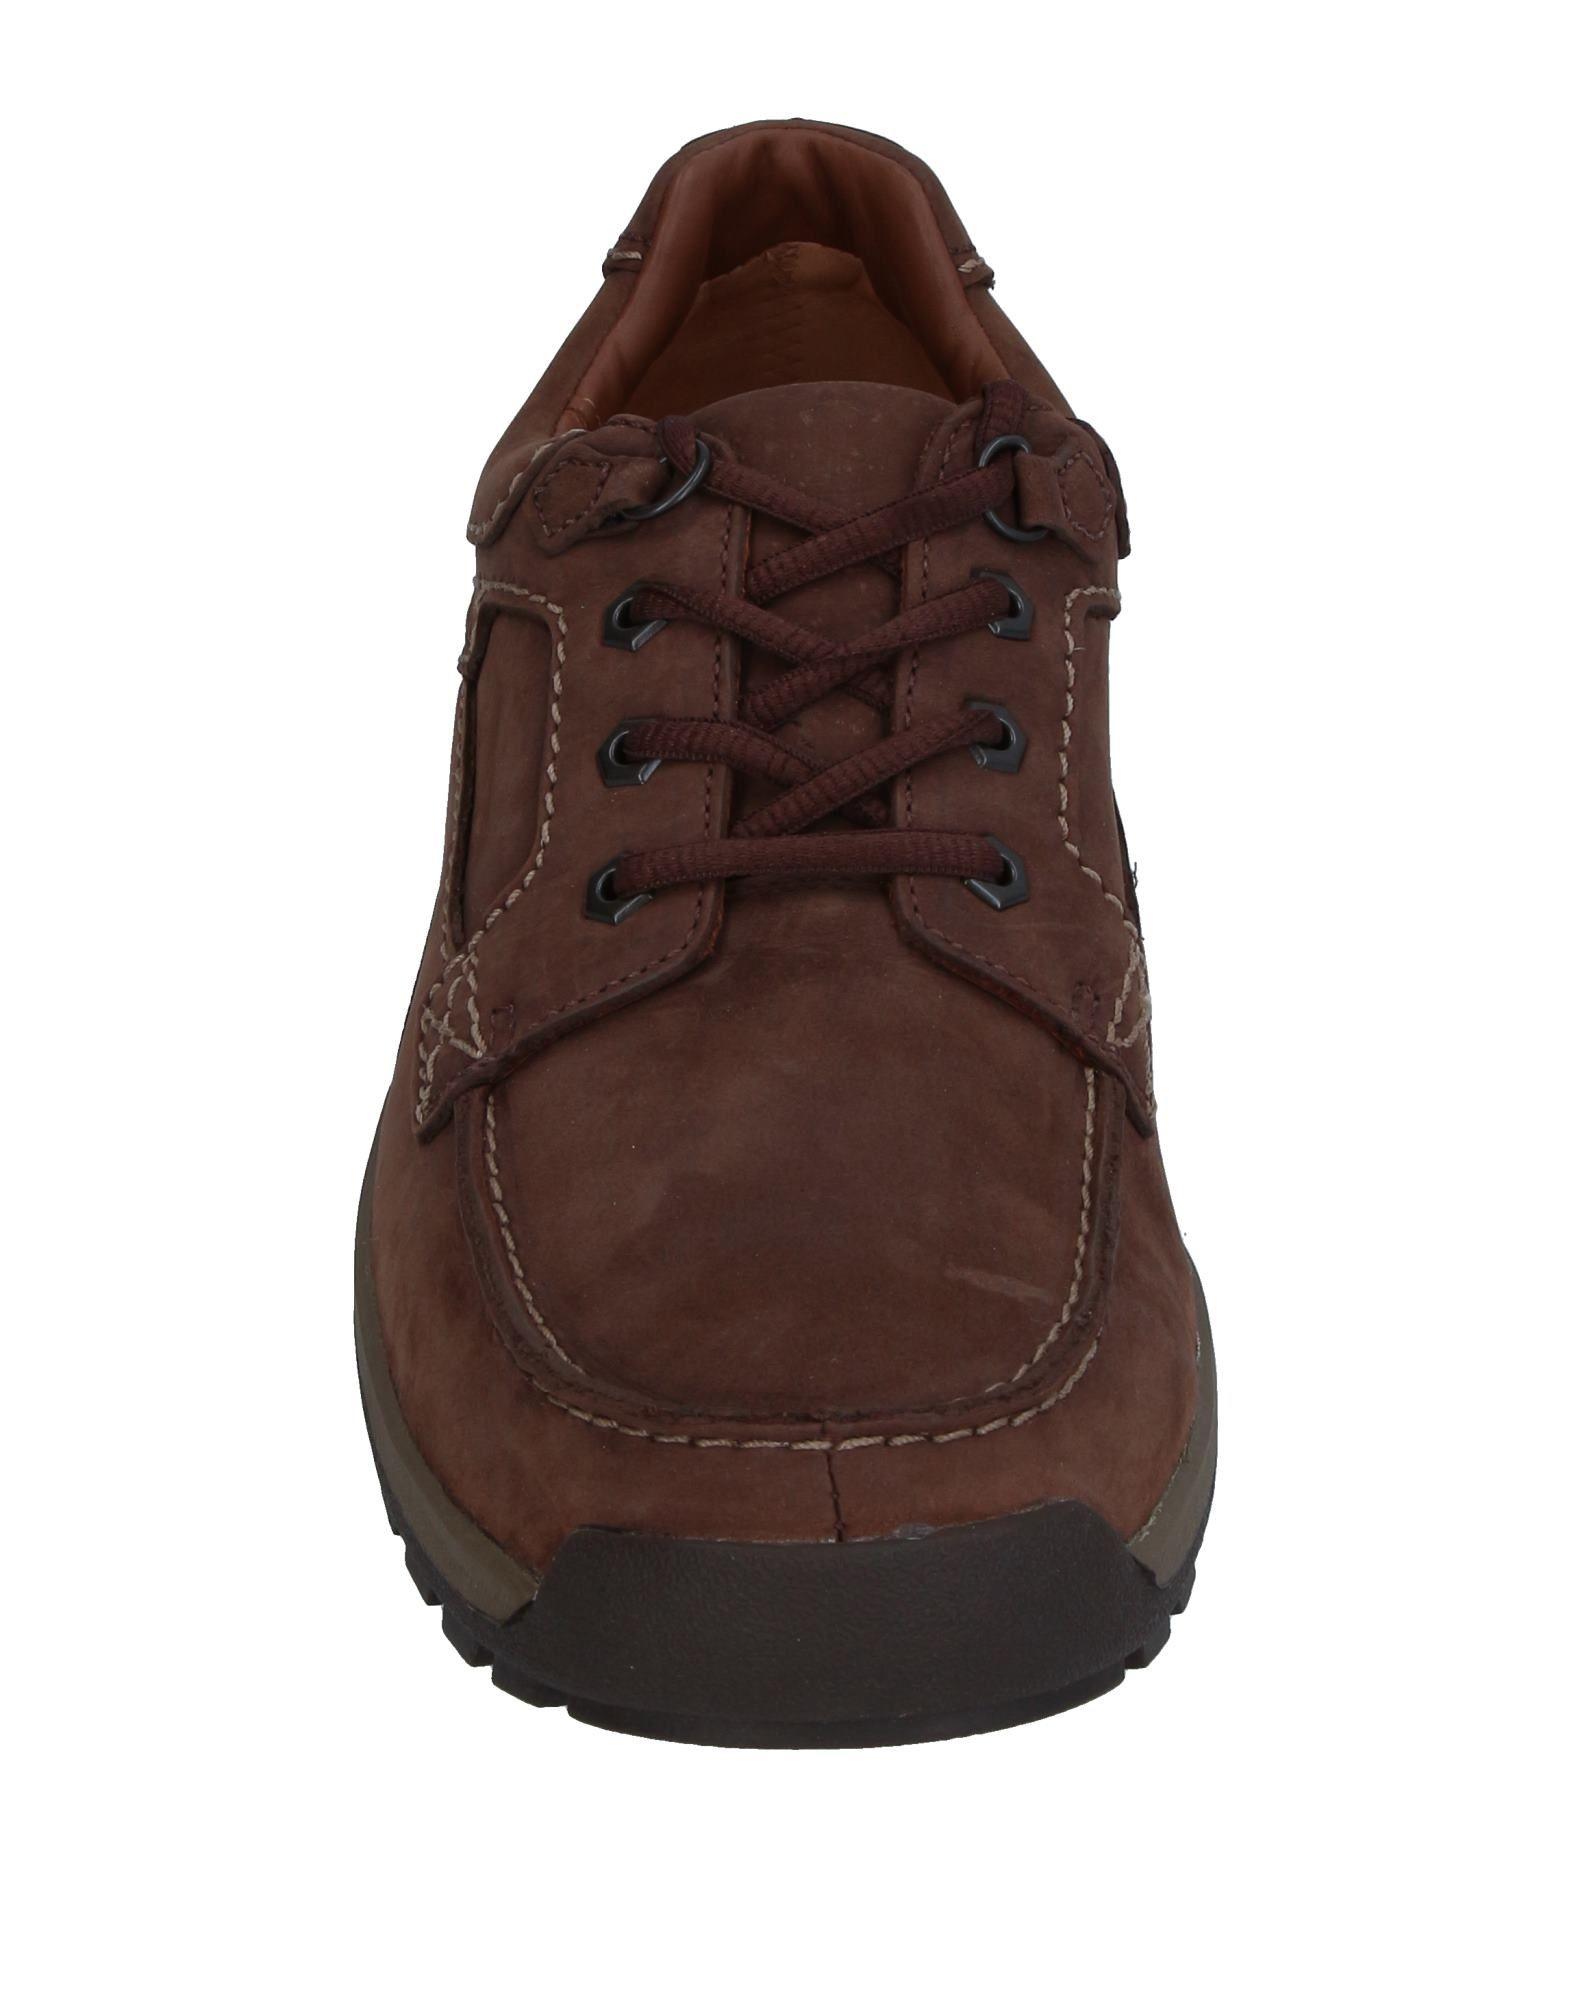 Sneakers Clarks Homme - Sneakers Clarks sur